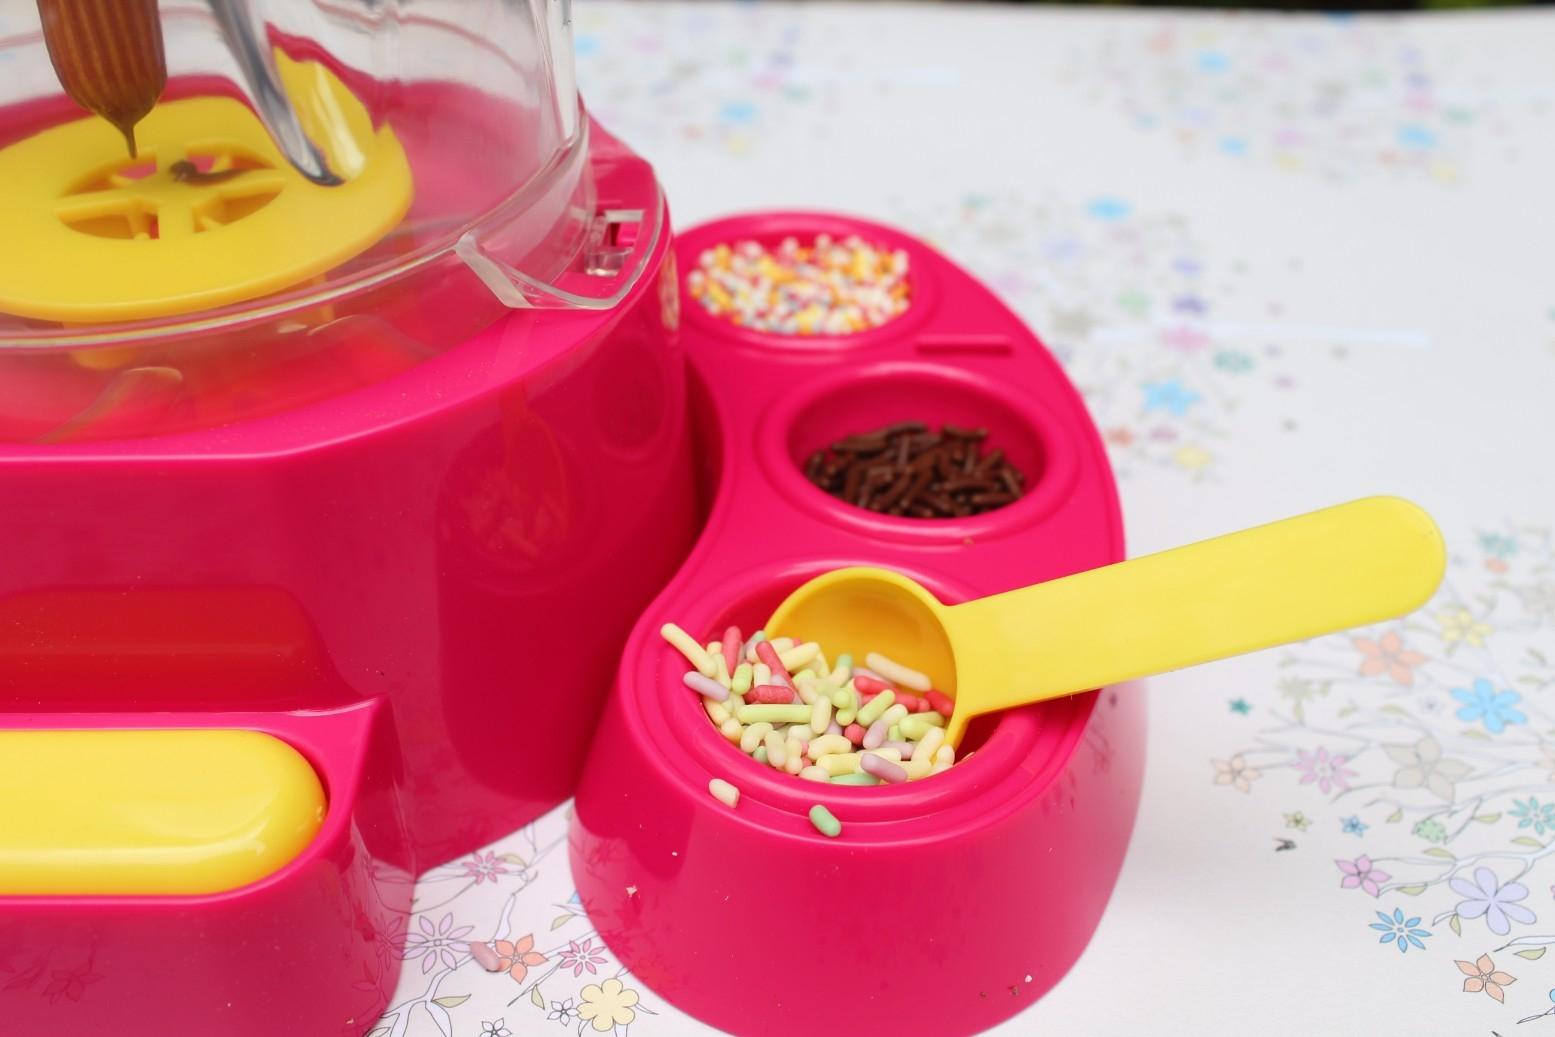 Chocolate Sprinkle Stix Toy John Adams Review (1)